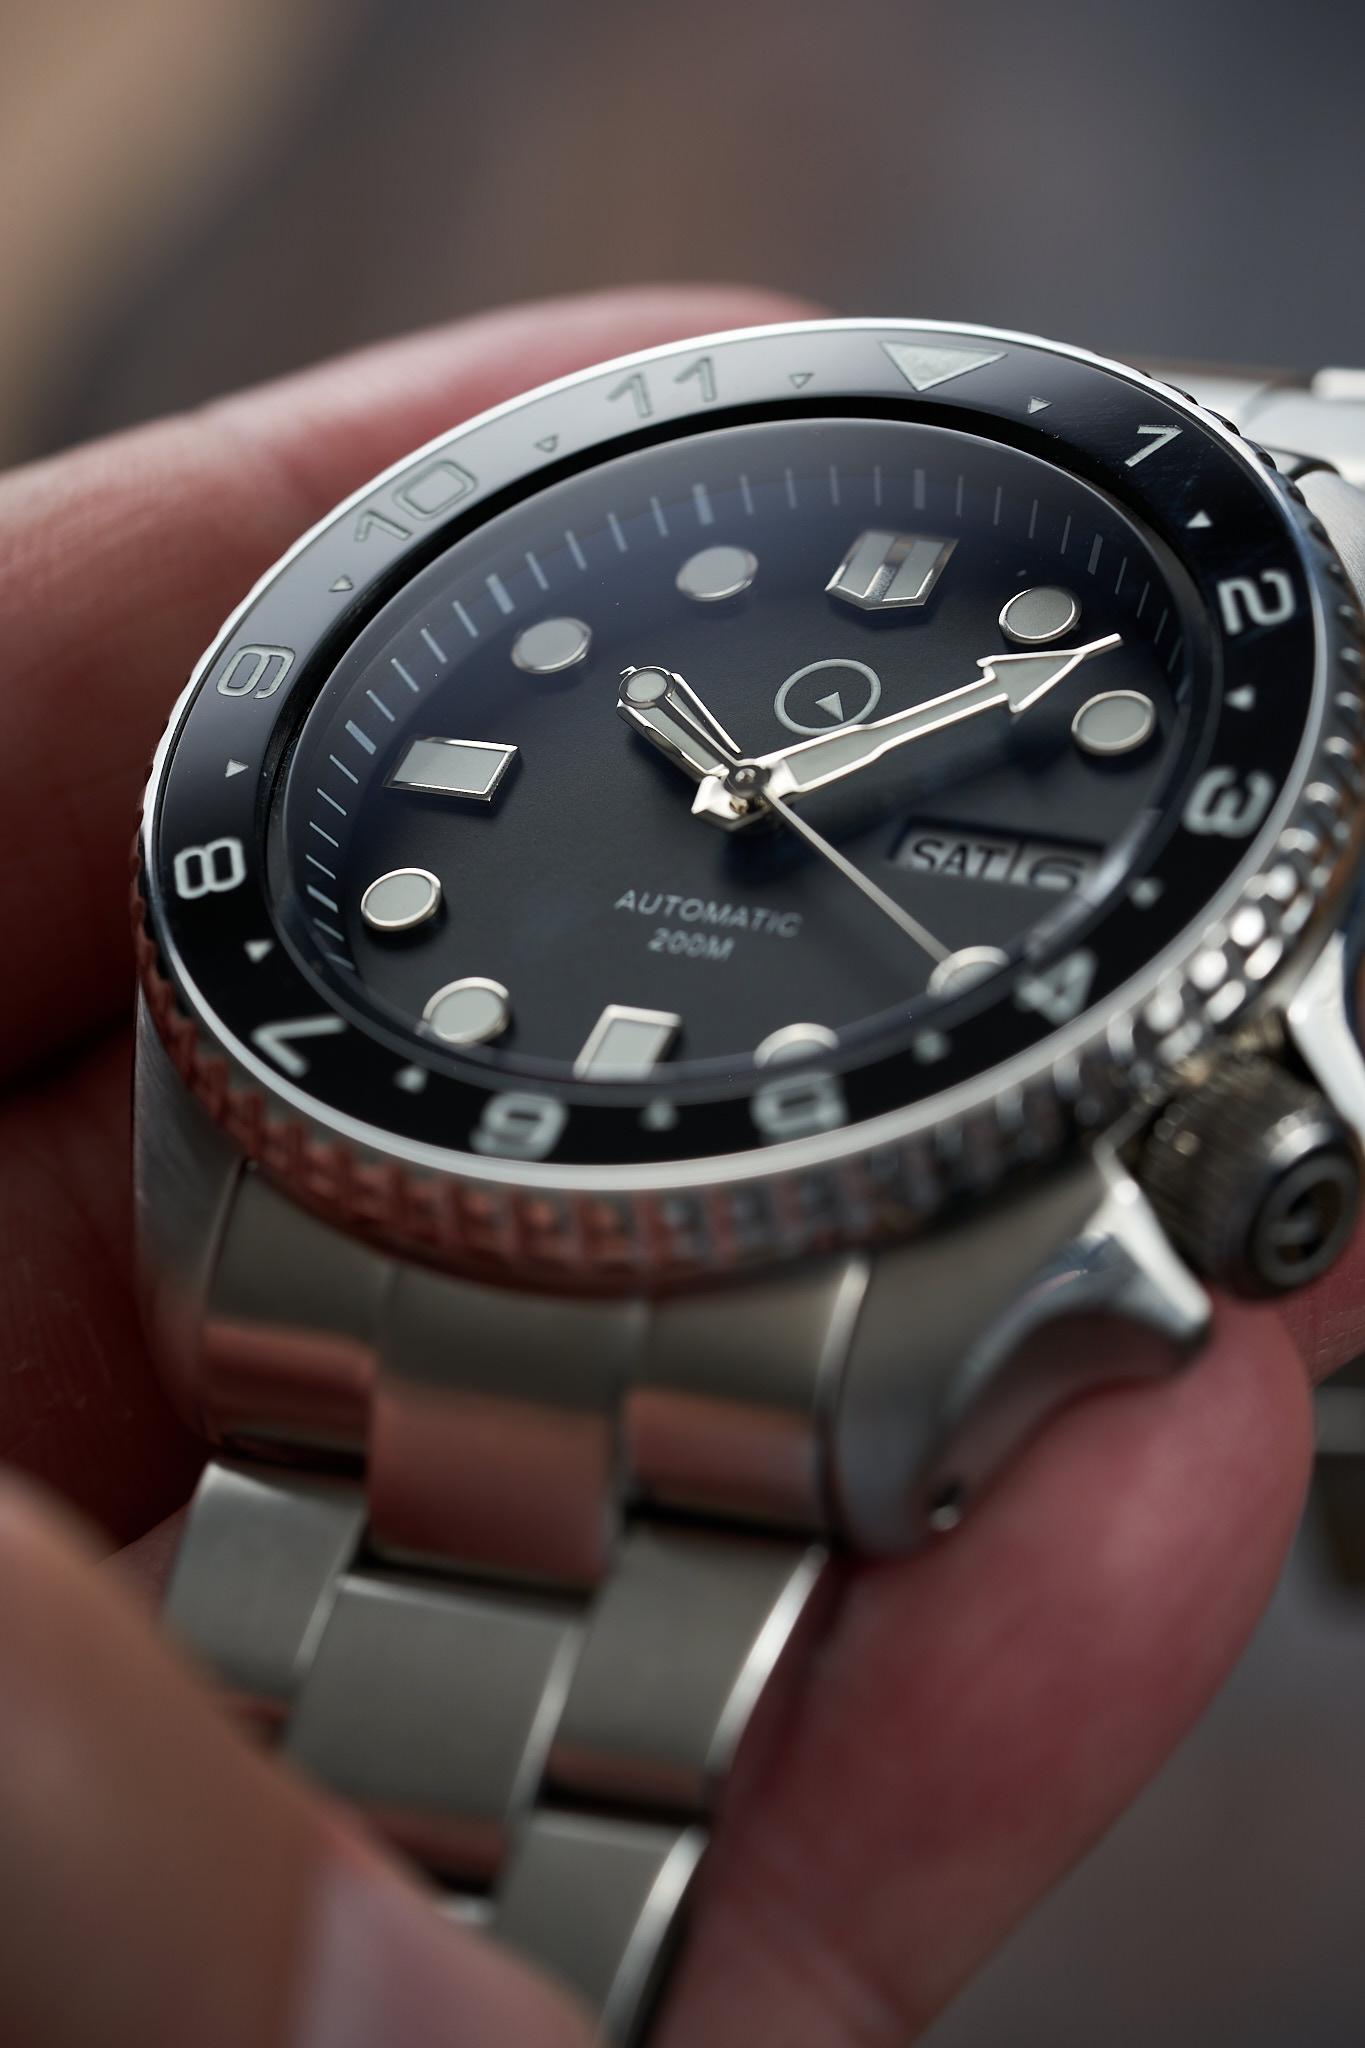 Islander-Watch-ISL-01-Long-Island-Watch-dial-details